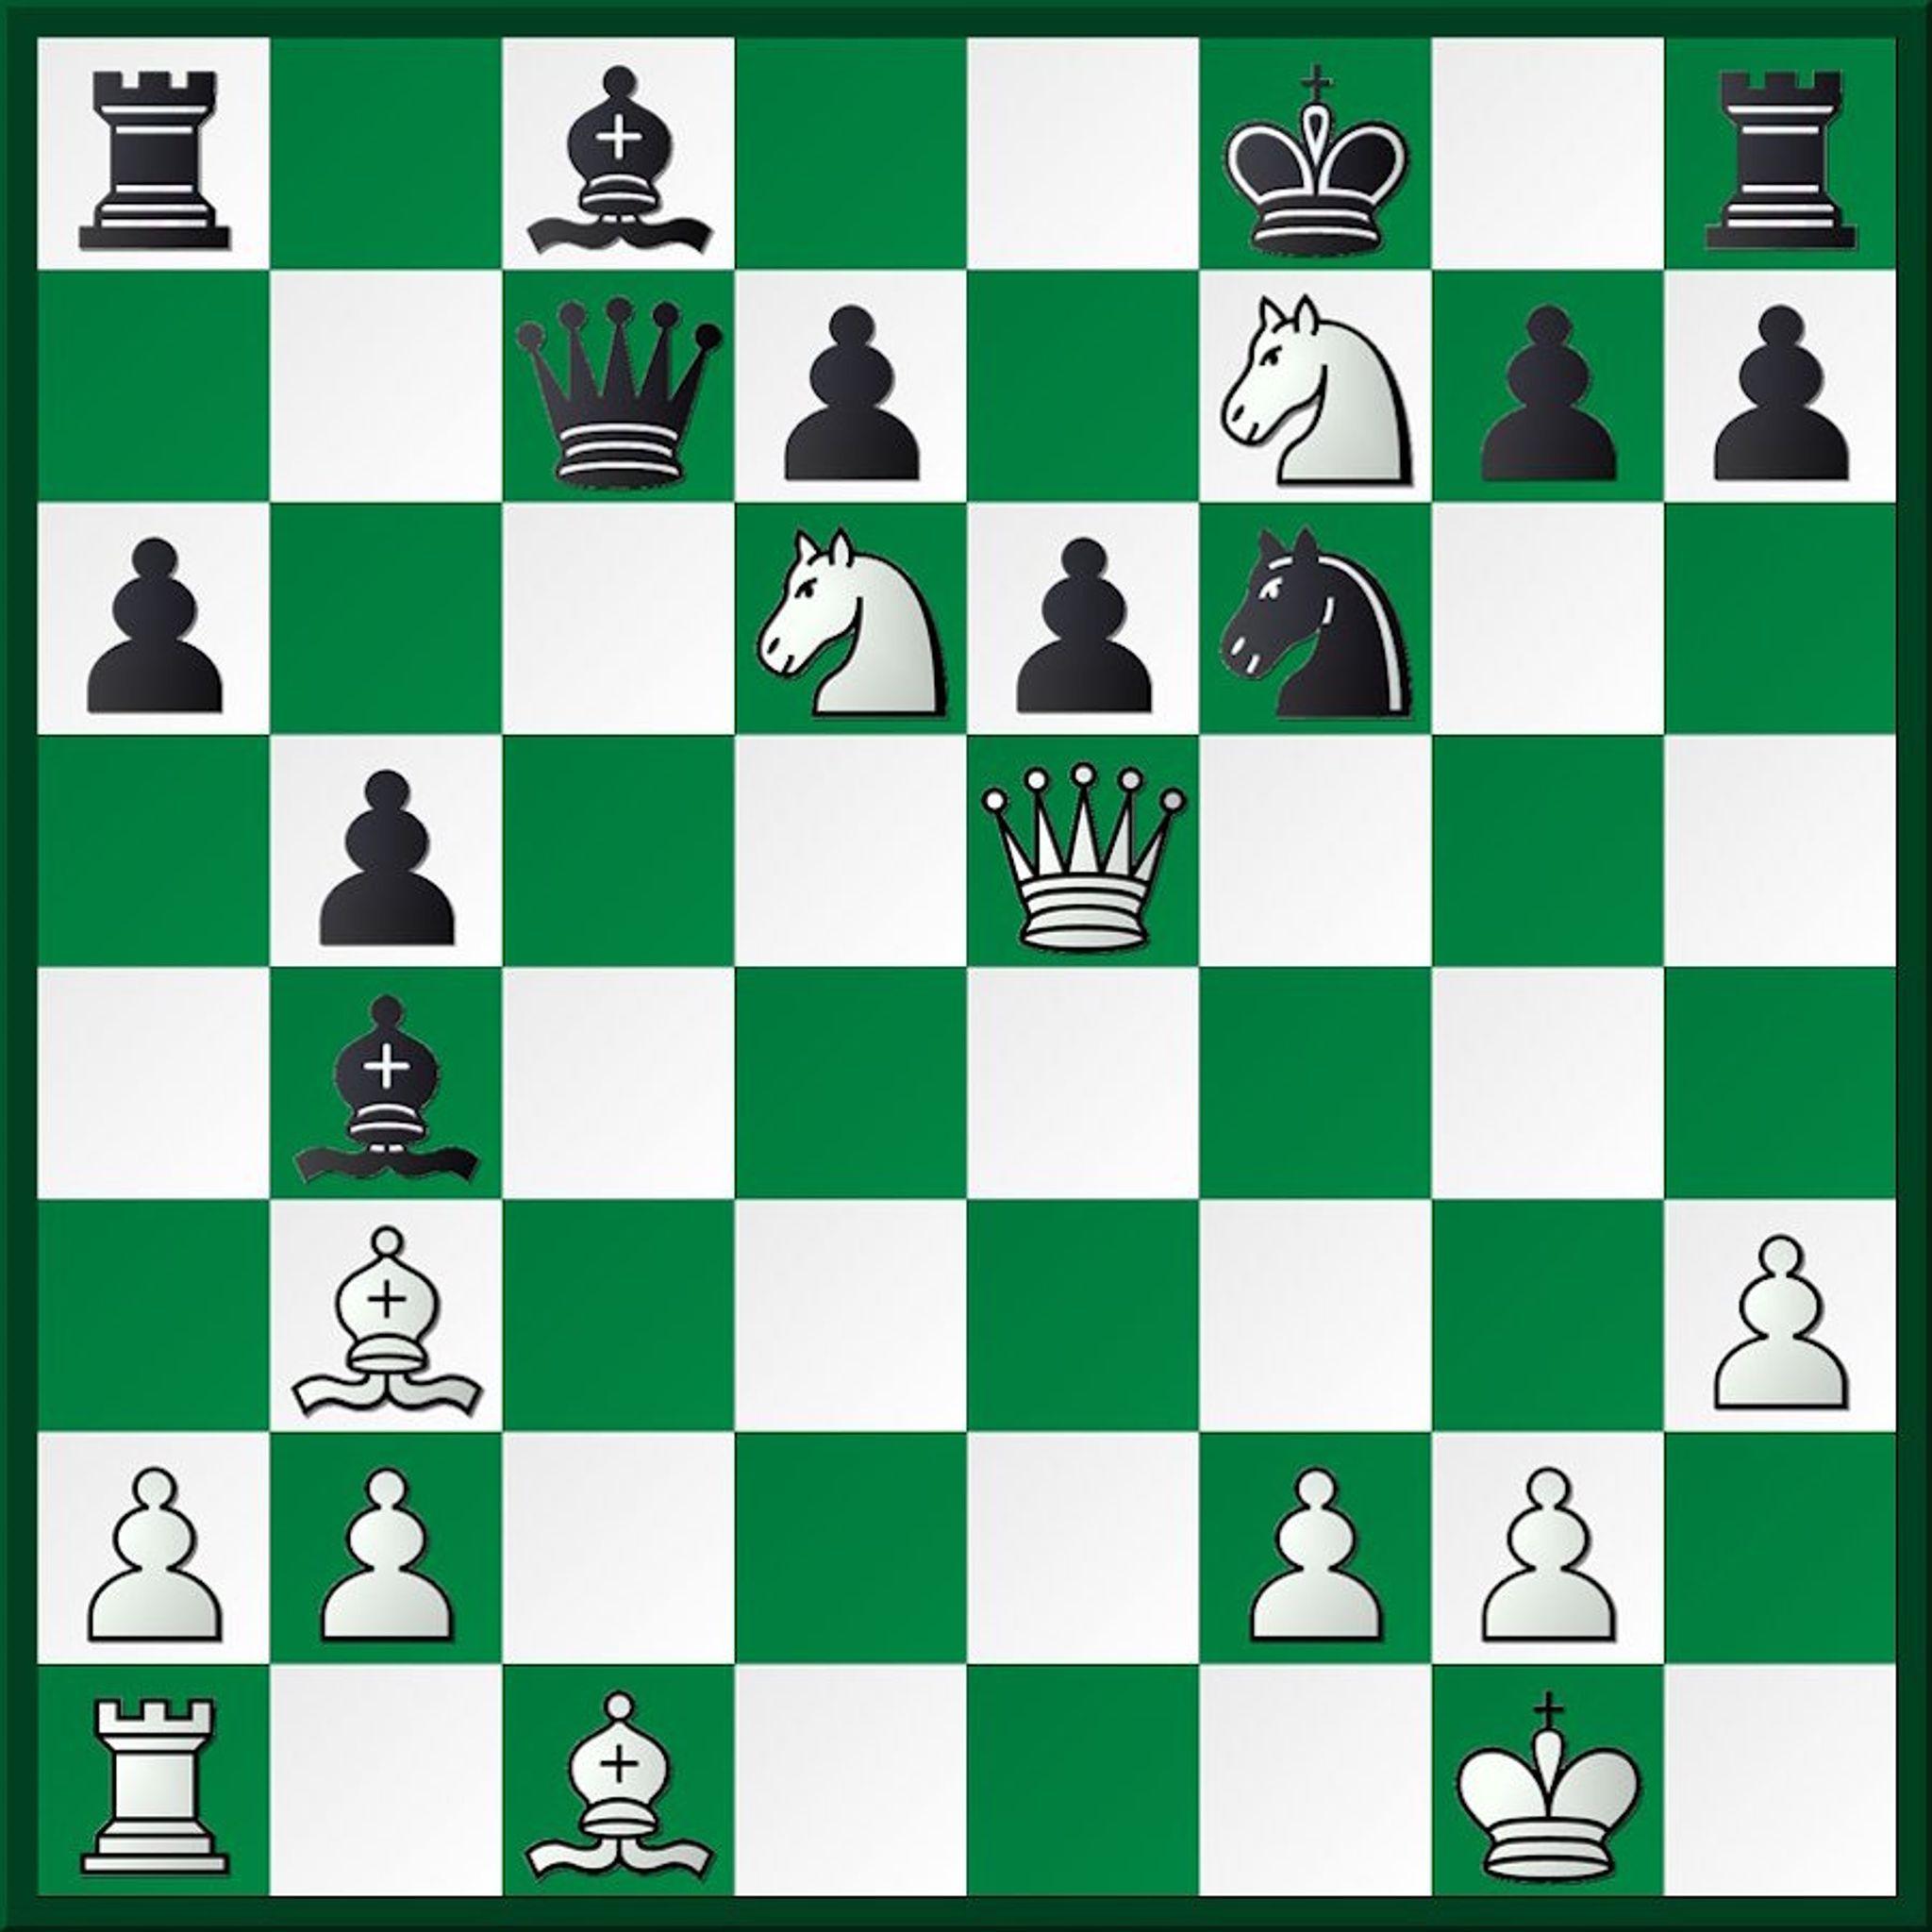 e93c9aeba4d4 U.S. star Fabiano Caruana earns world chess title match with Carlsen ...